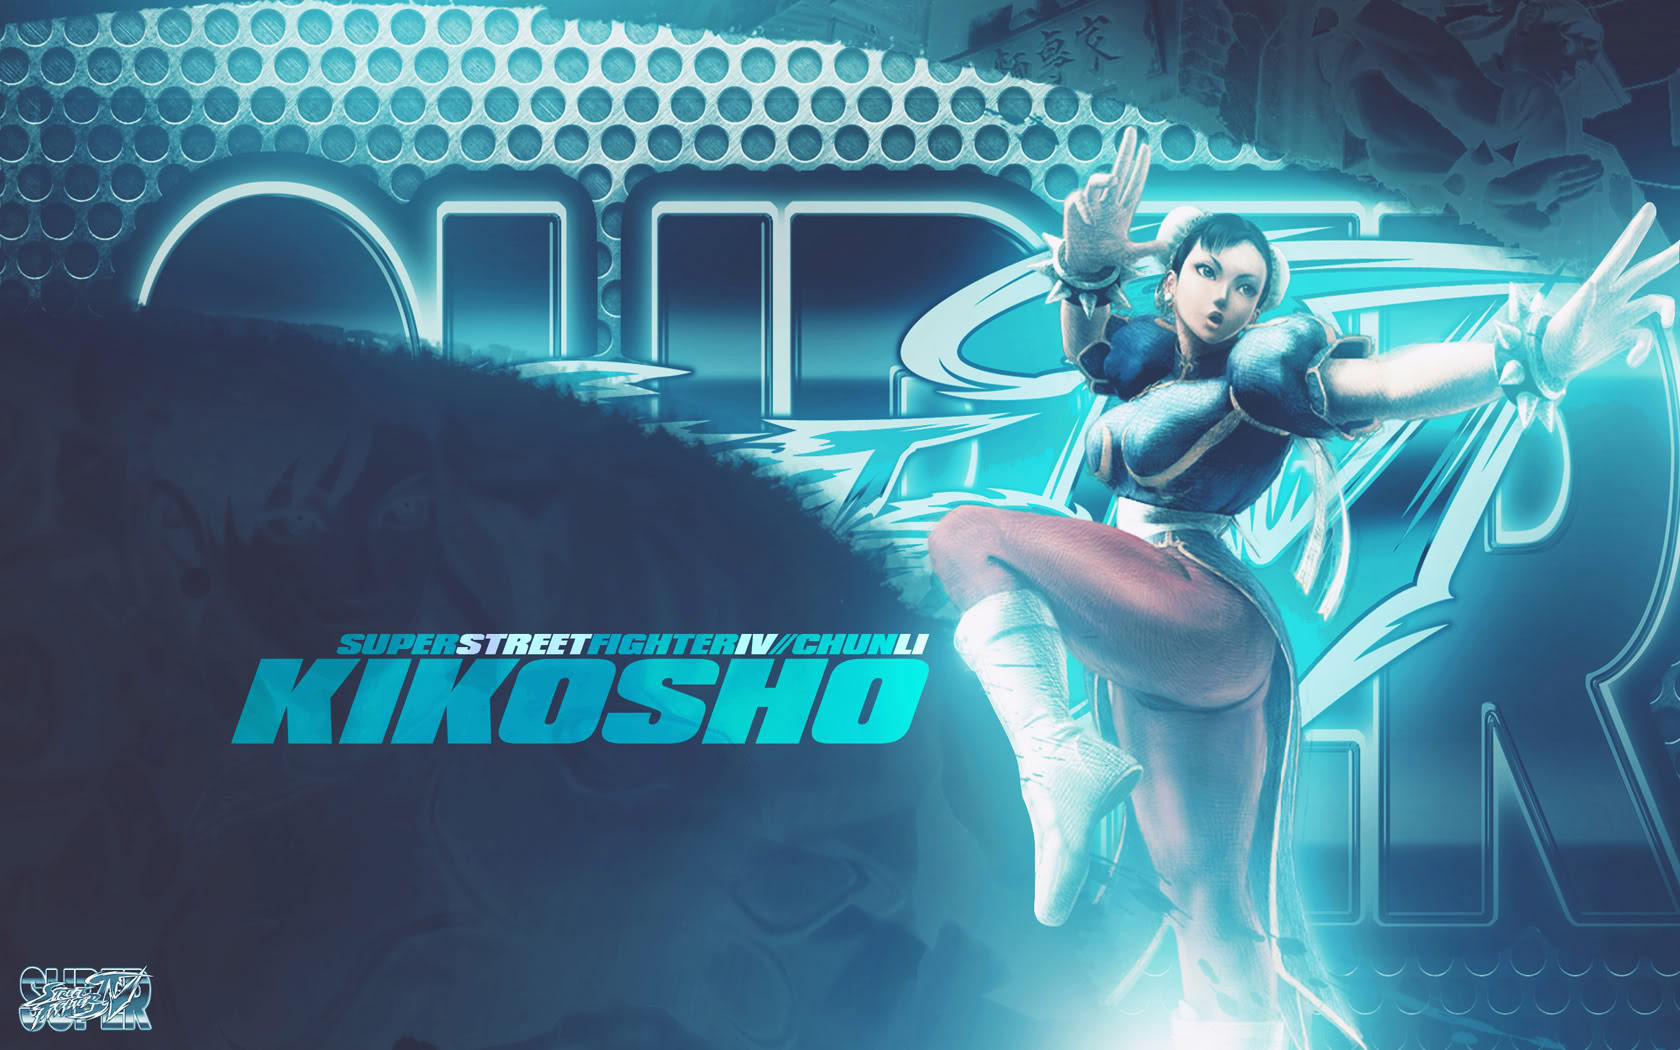 Chun-Li Super Street Fighter 4 wallpaper by BossLogic